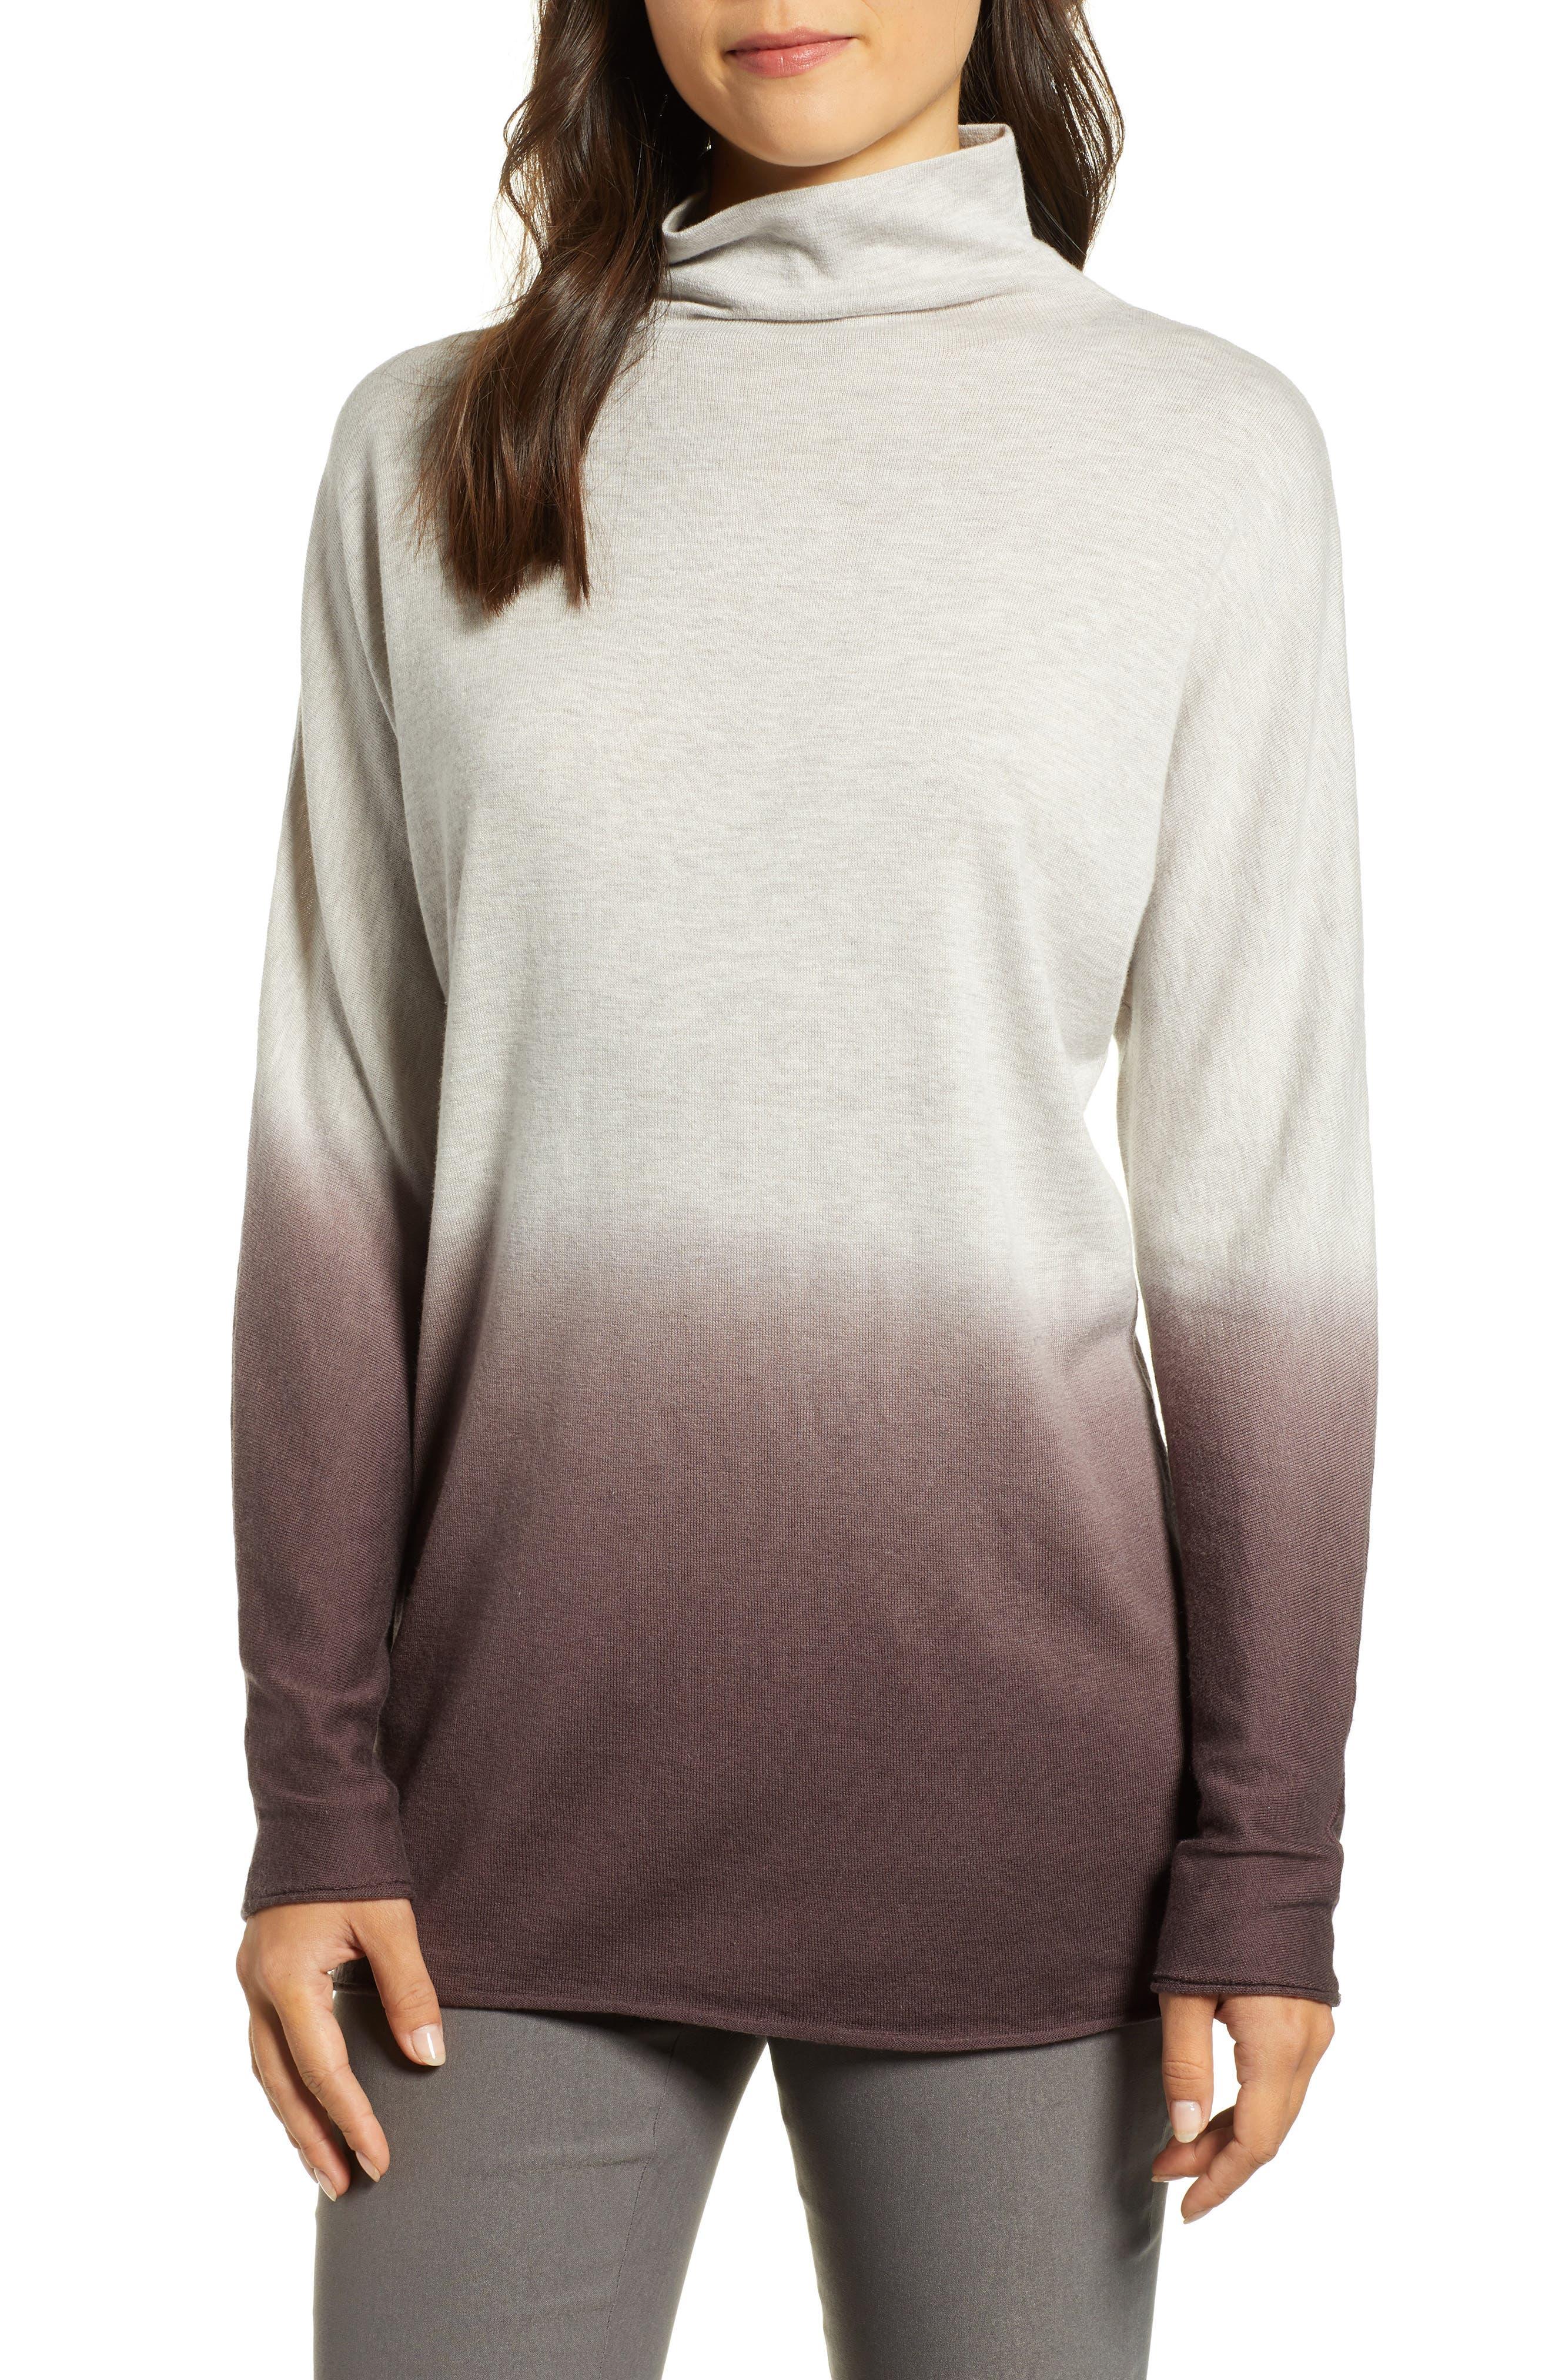 Nic+Zoe Traveler Ombre Tunic Sweater in Plum